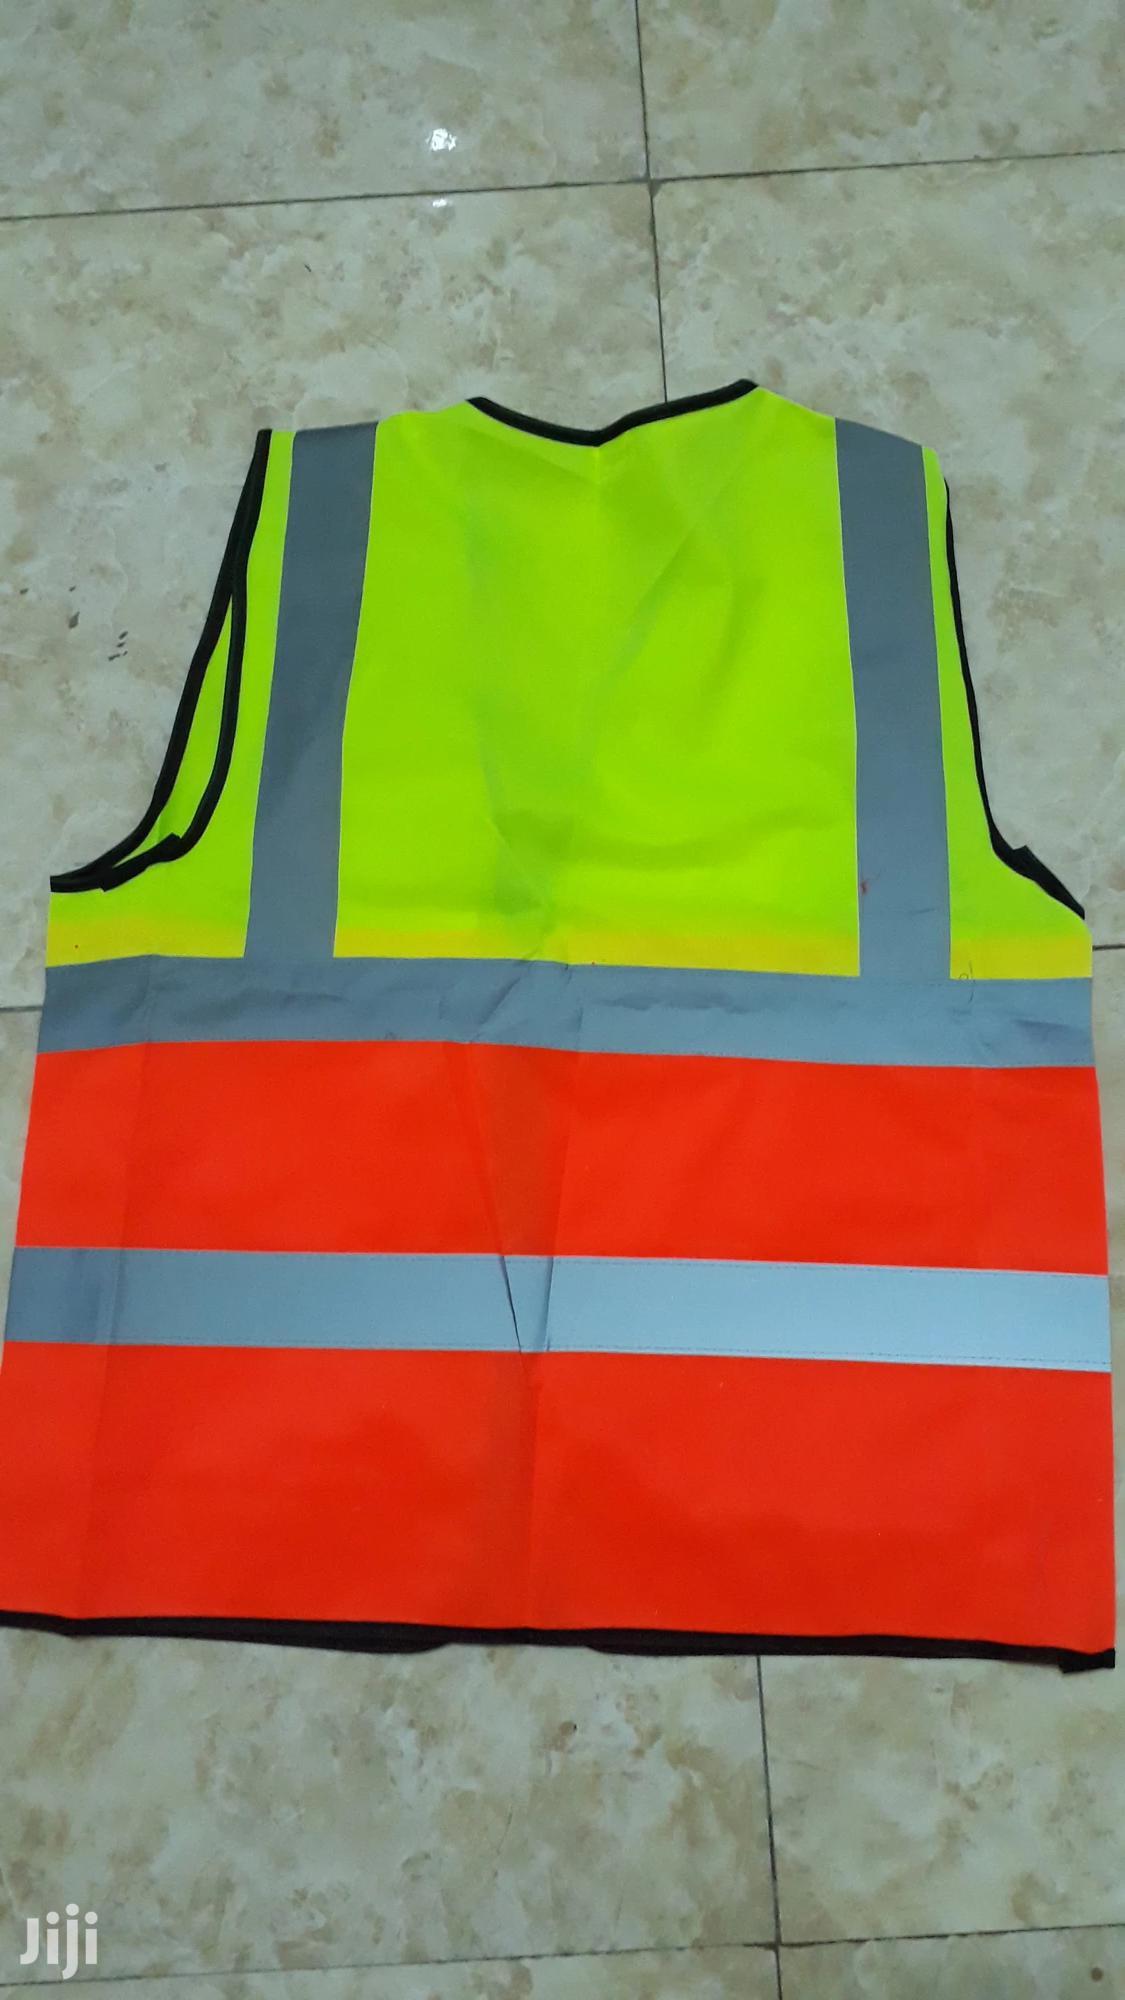 Double Colour Reflective Vest With Pockets